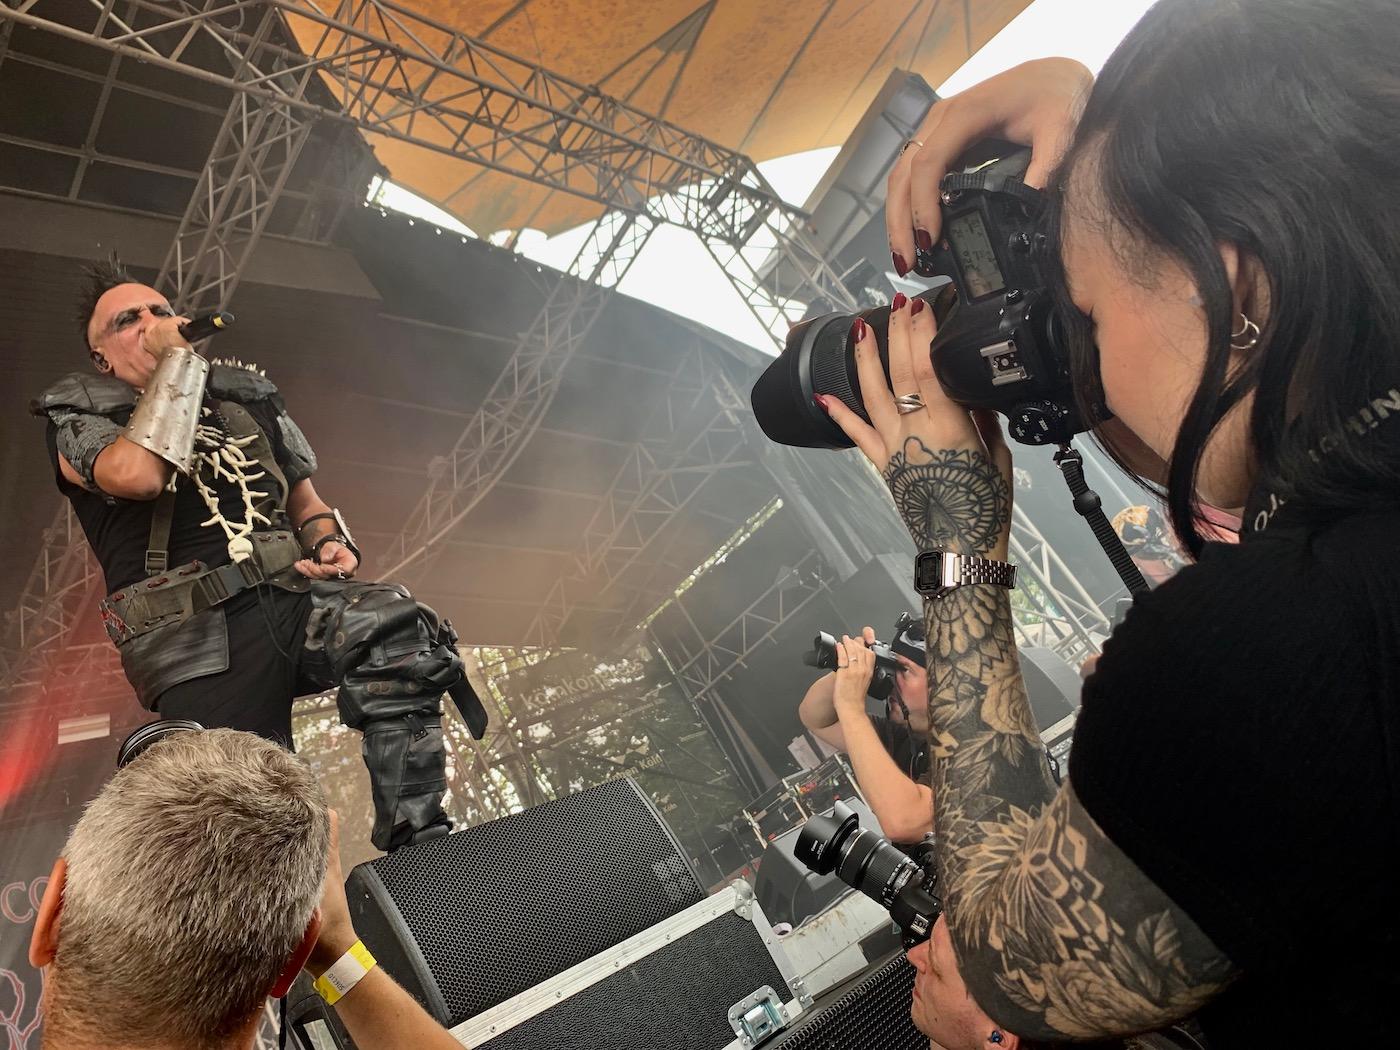 mark_benecke_amphi_festival_koeln_2019 - 54.jpg